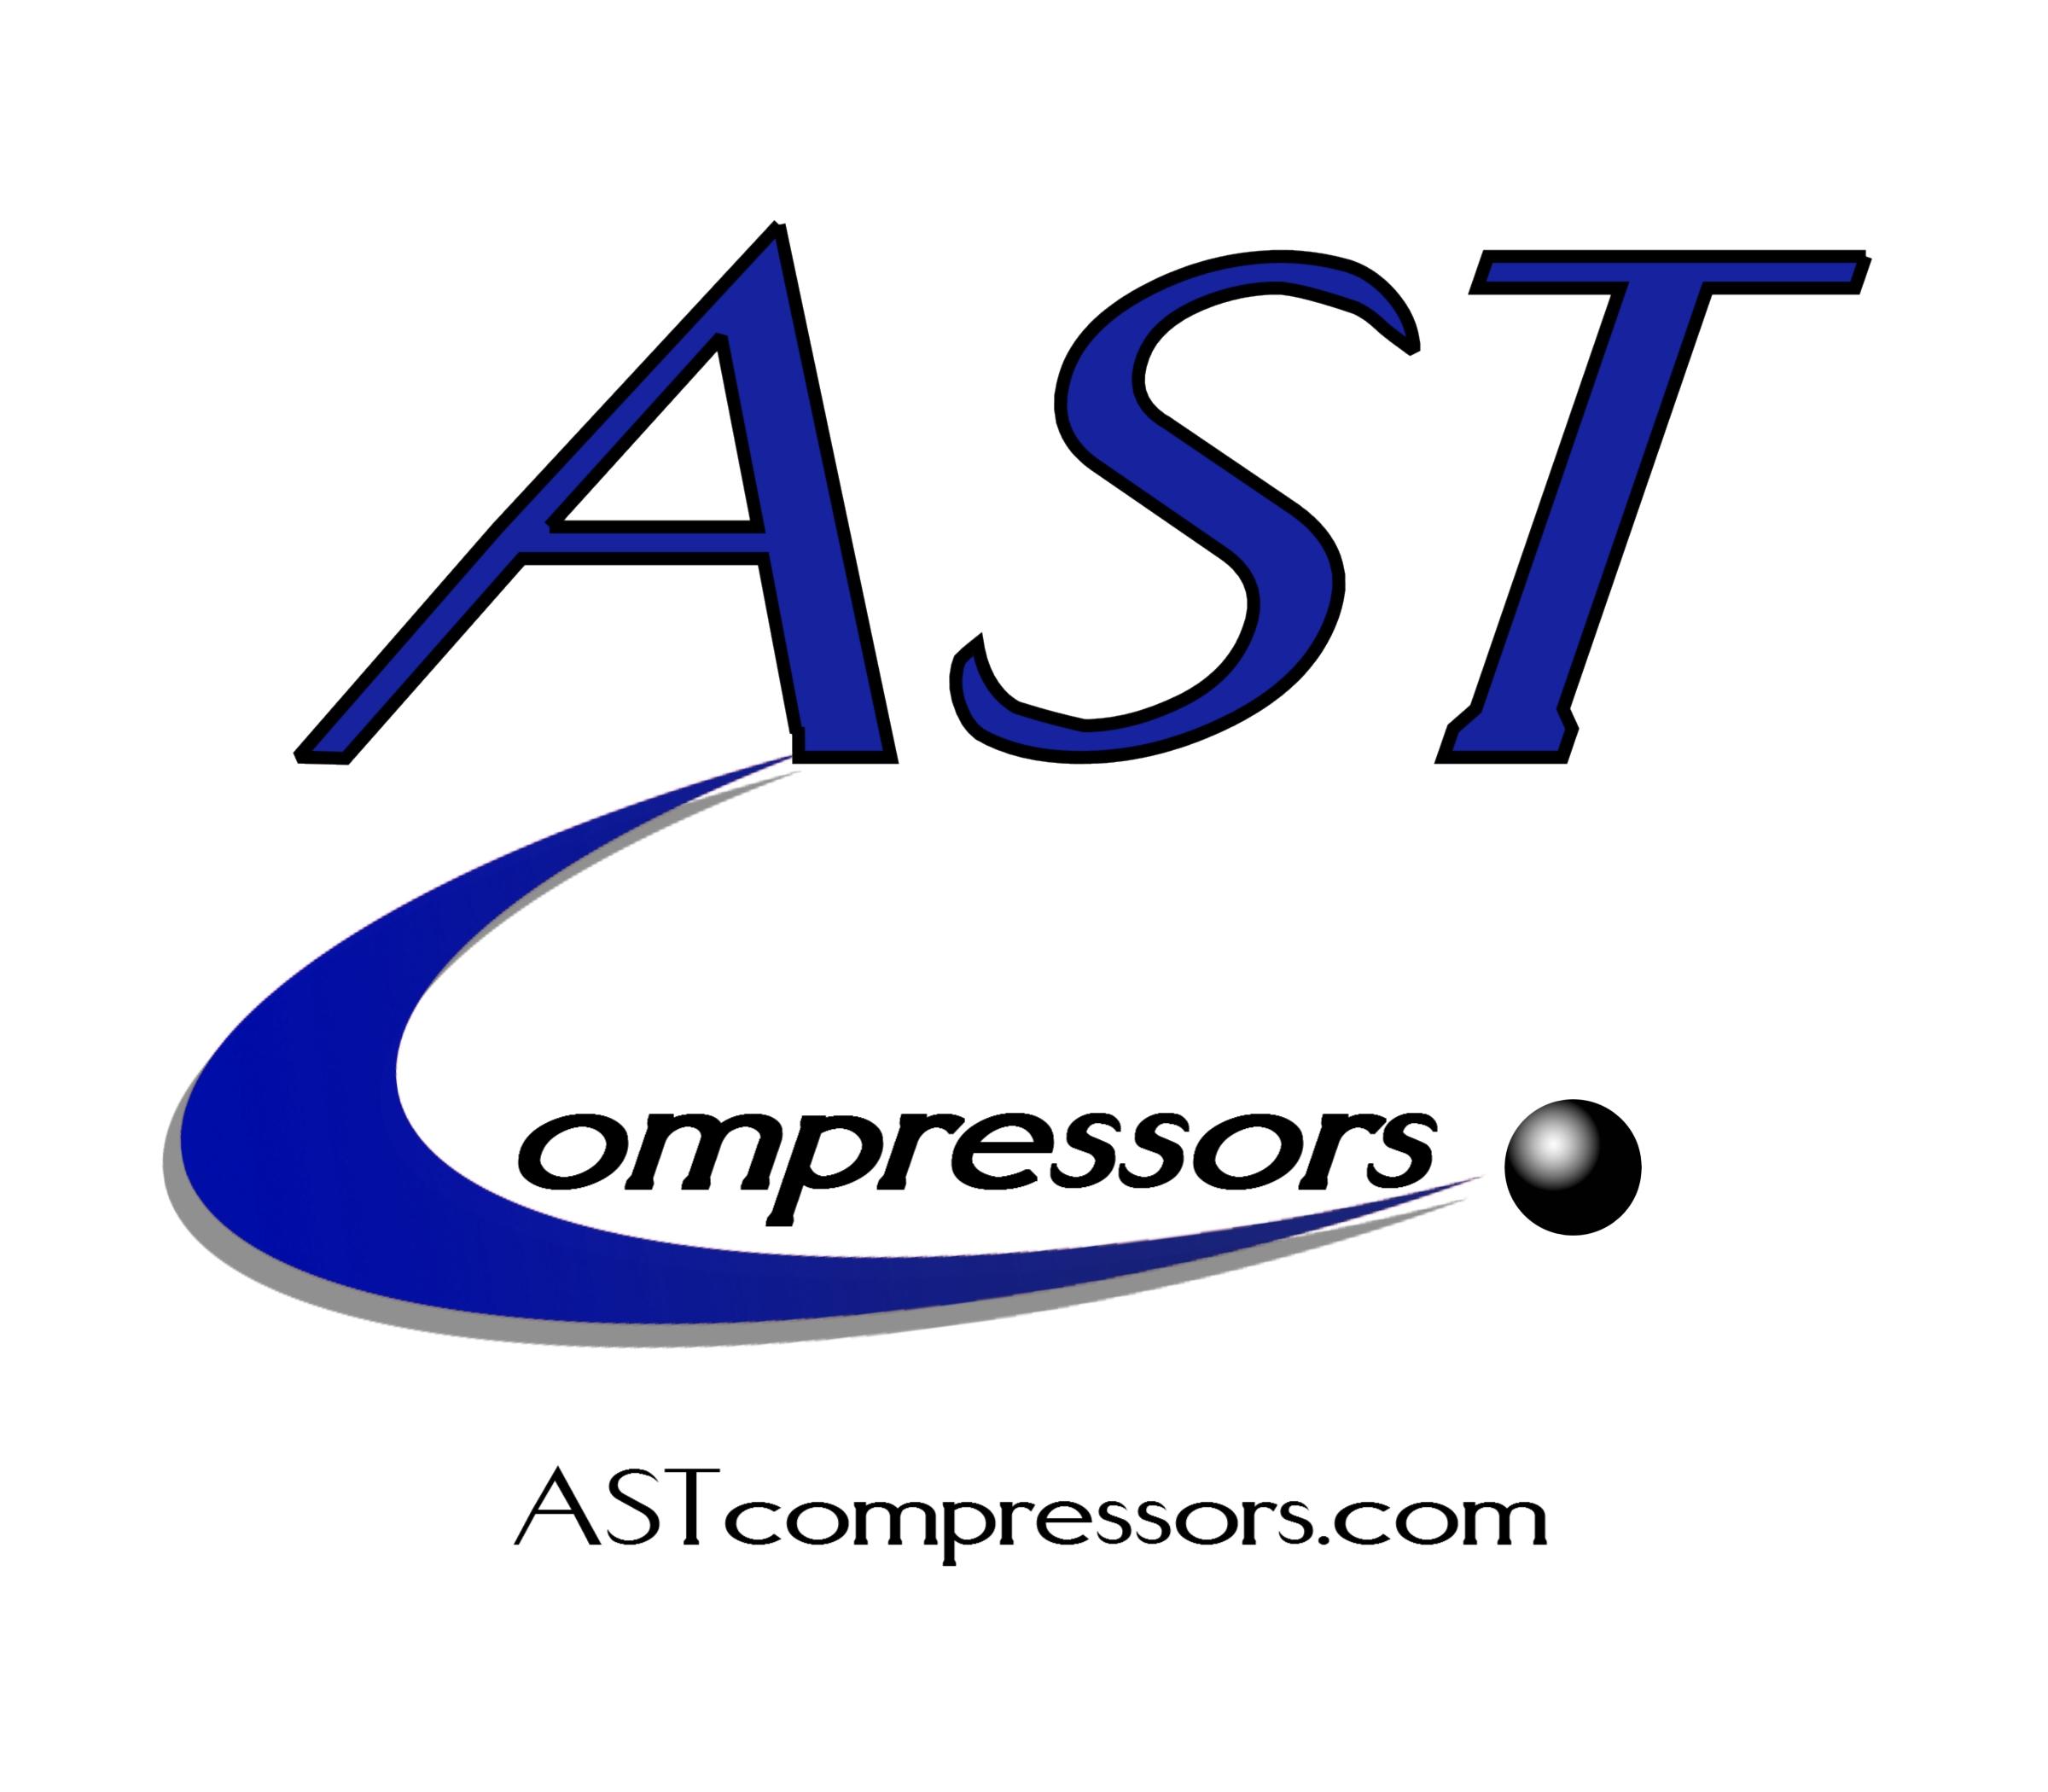 AST Compressors